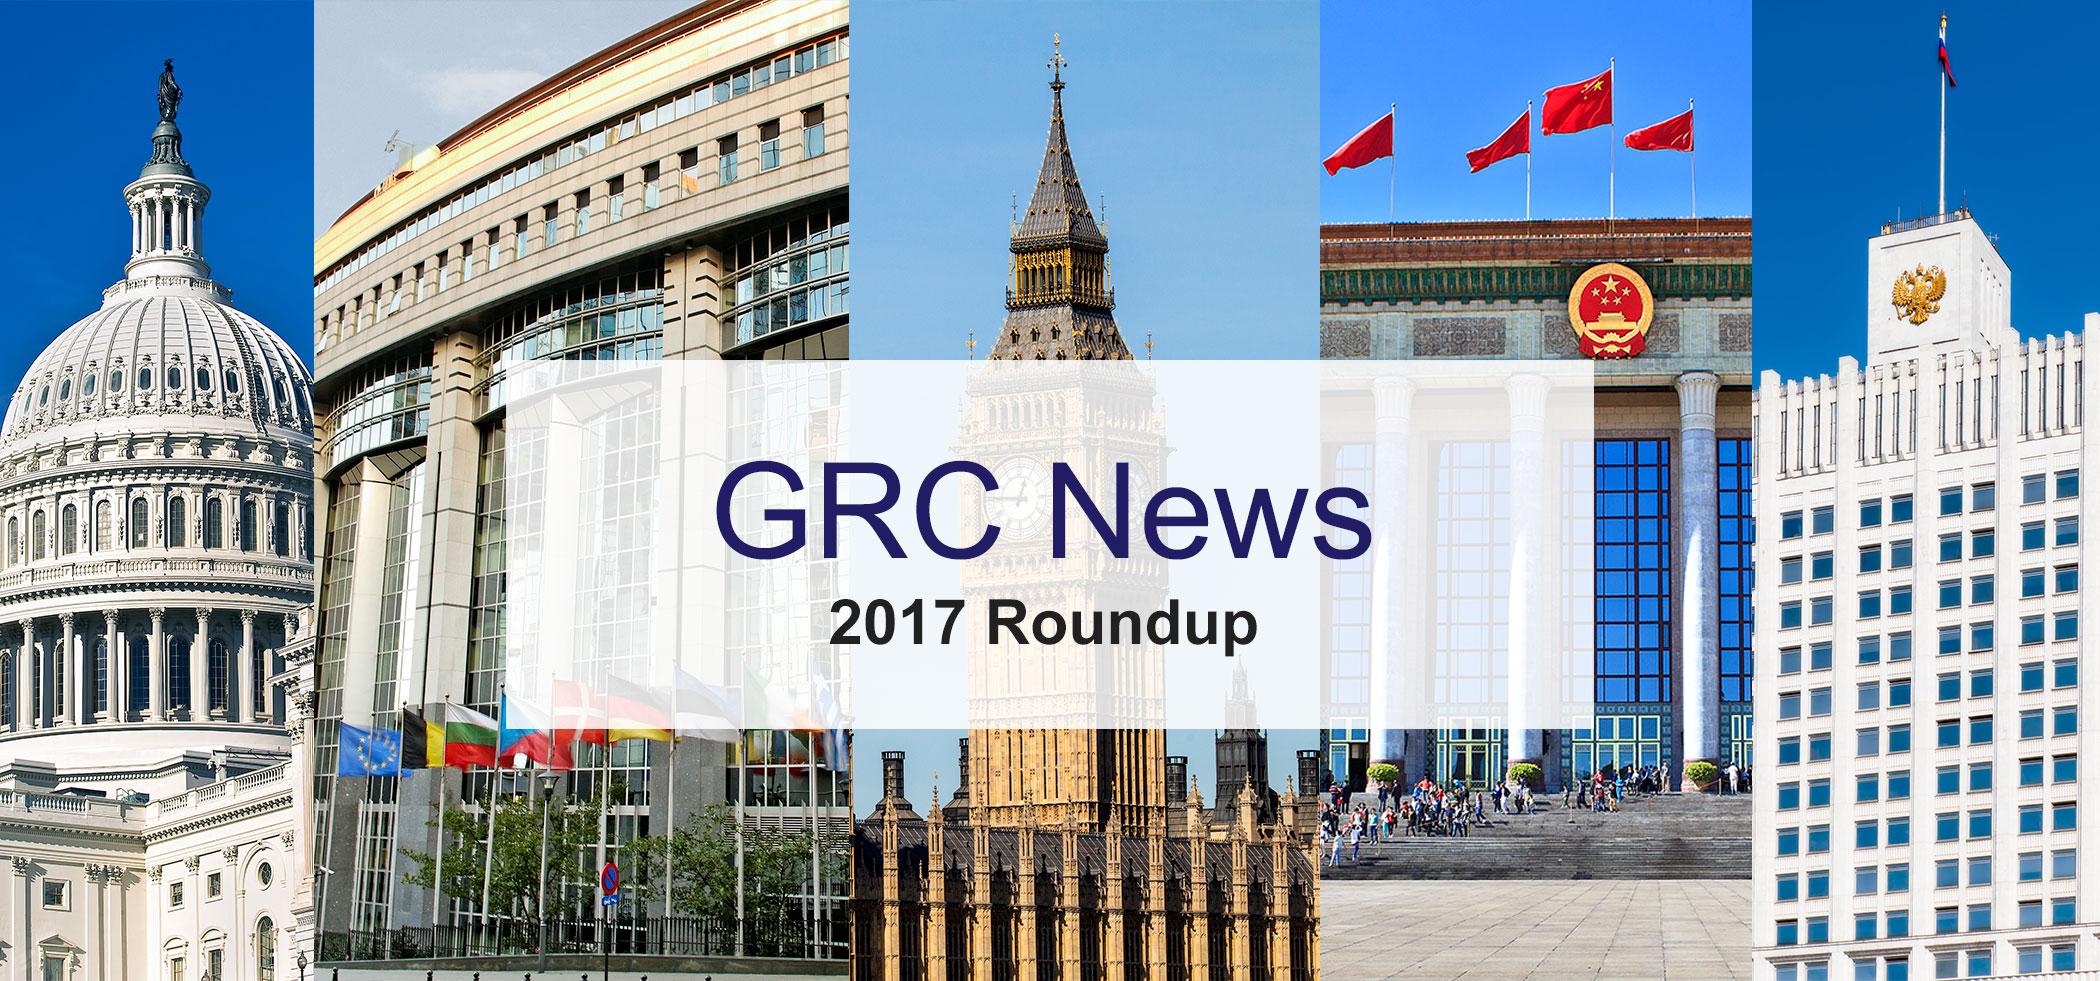 GRC-News-2017Roundup.jpg